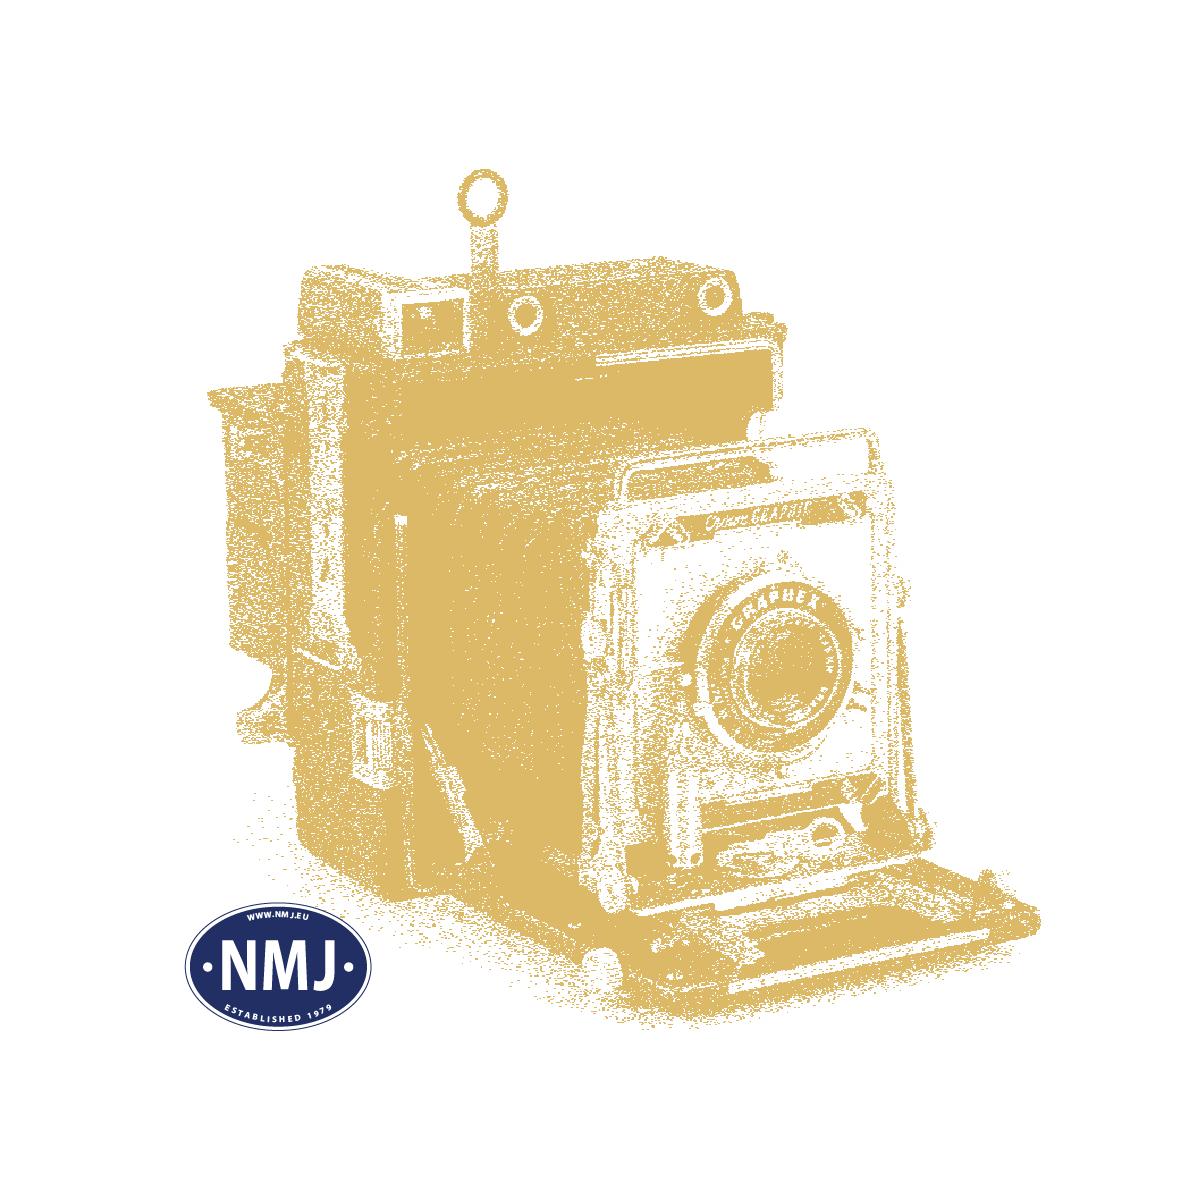 NMJT507.103 - NMJ Topline CargoNet Lgns 42 76 443 2142-9 w/ Linjegods Thermo Cont.